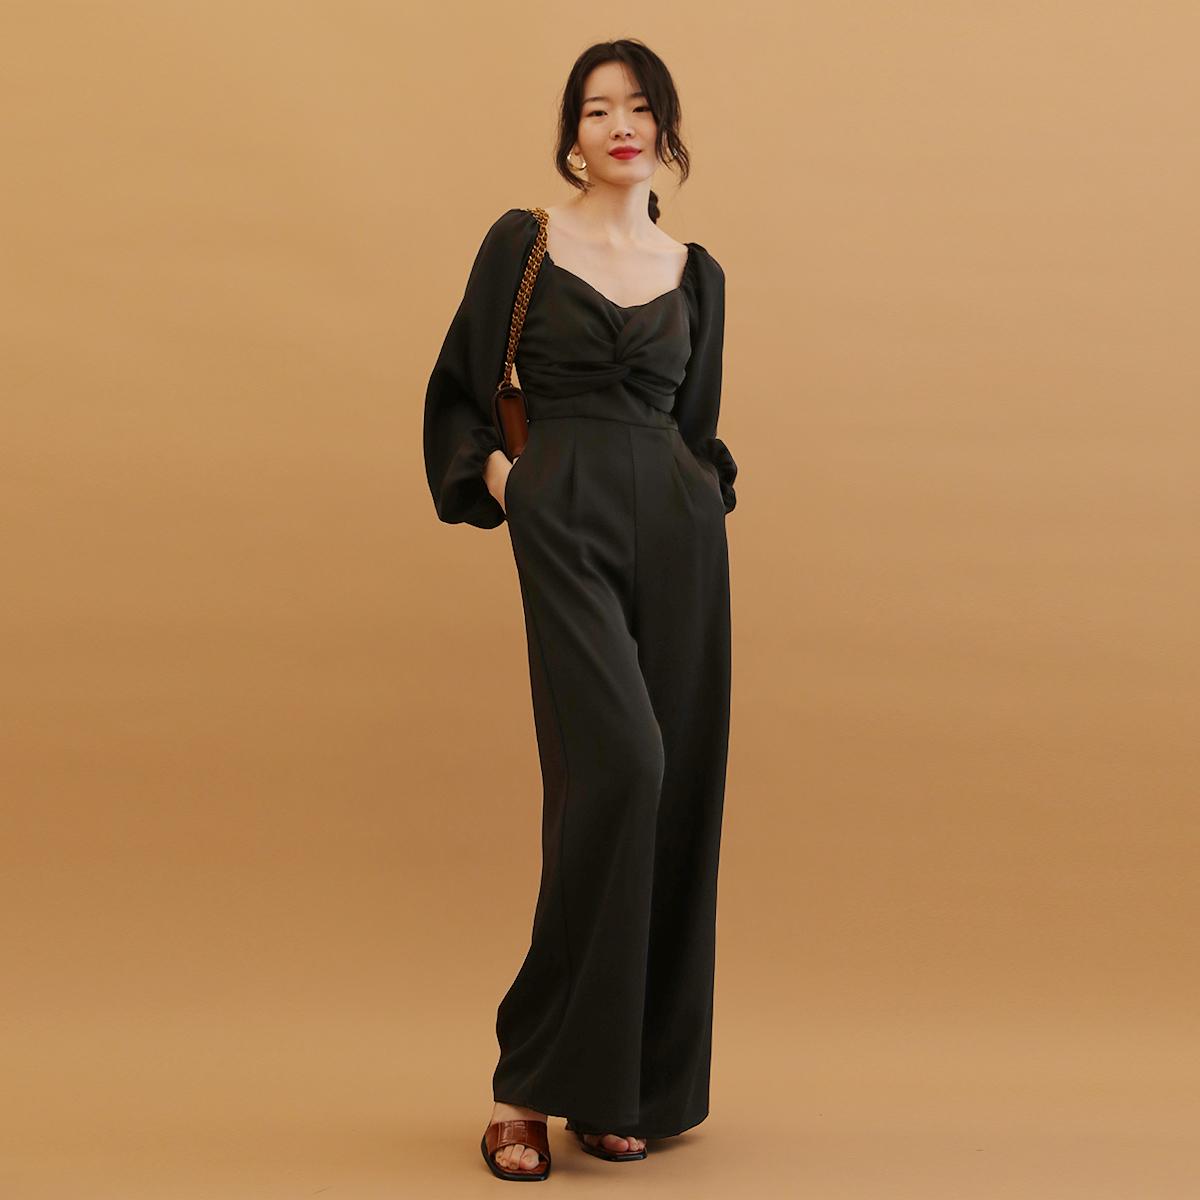 TANSSHOP比例chao好大长腿 扭结设计显瘦长袖连体裤阔腿长裤女